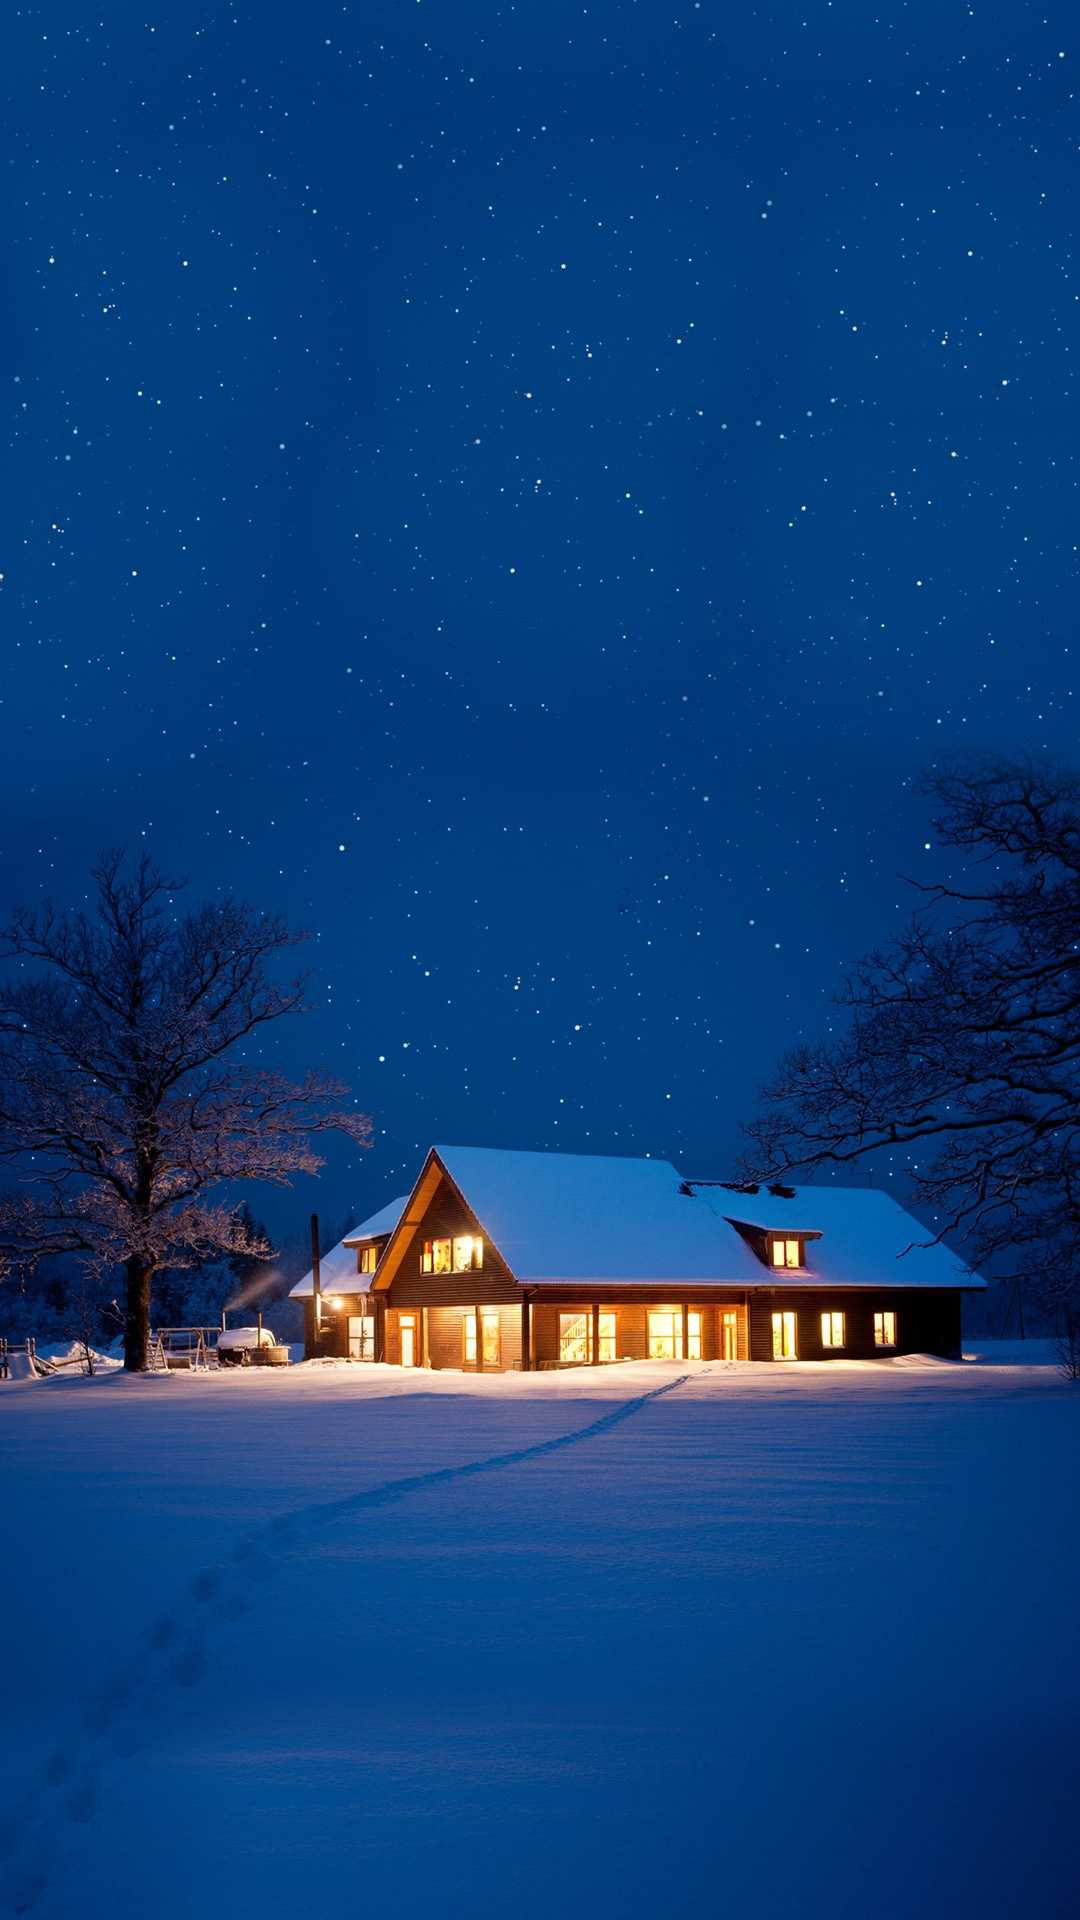 Snow House Christmas Night iPhone Wallpaper